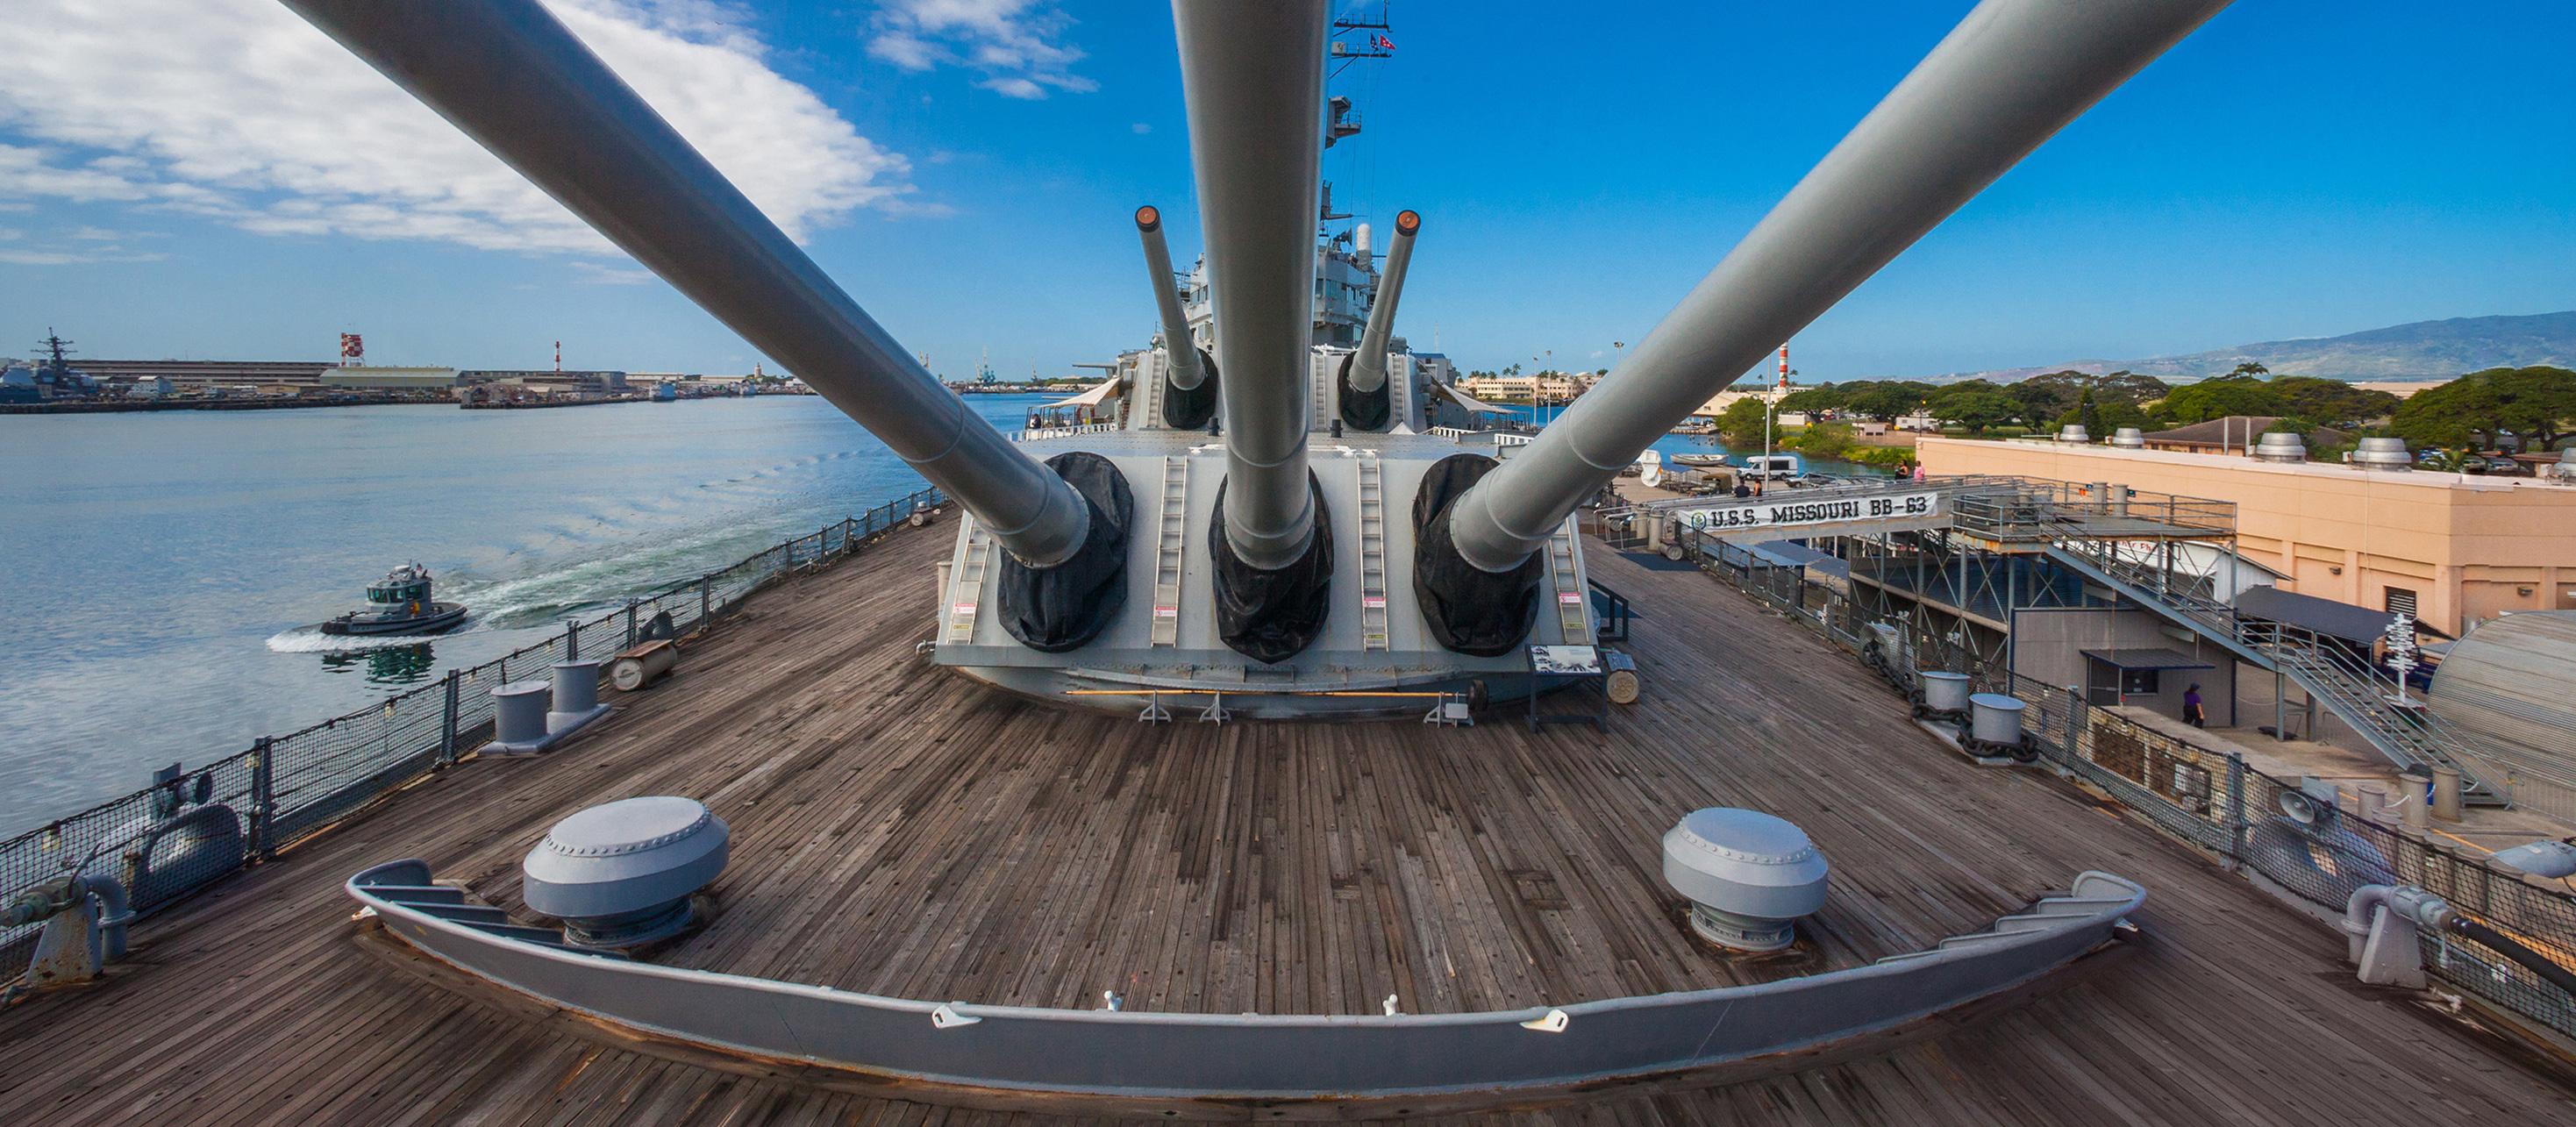 Aboard the deck of the battleship U S S Missouri, the barrels of 5 high-caliber guns are aimed skyward